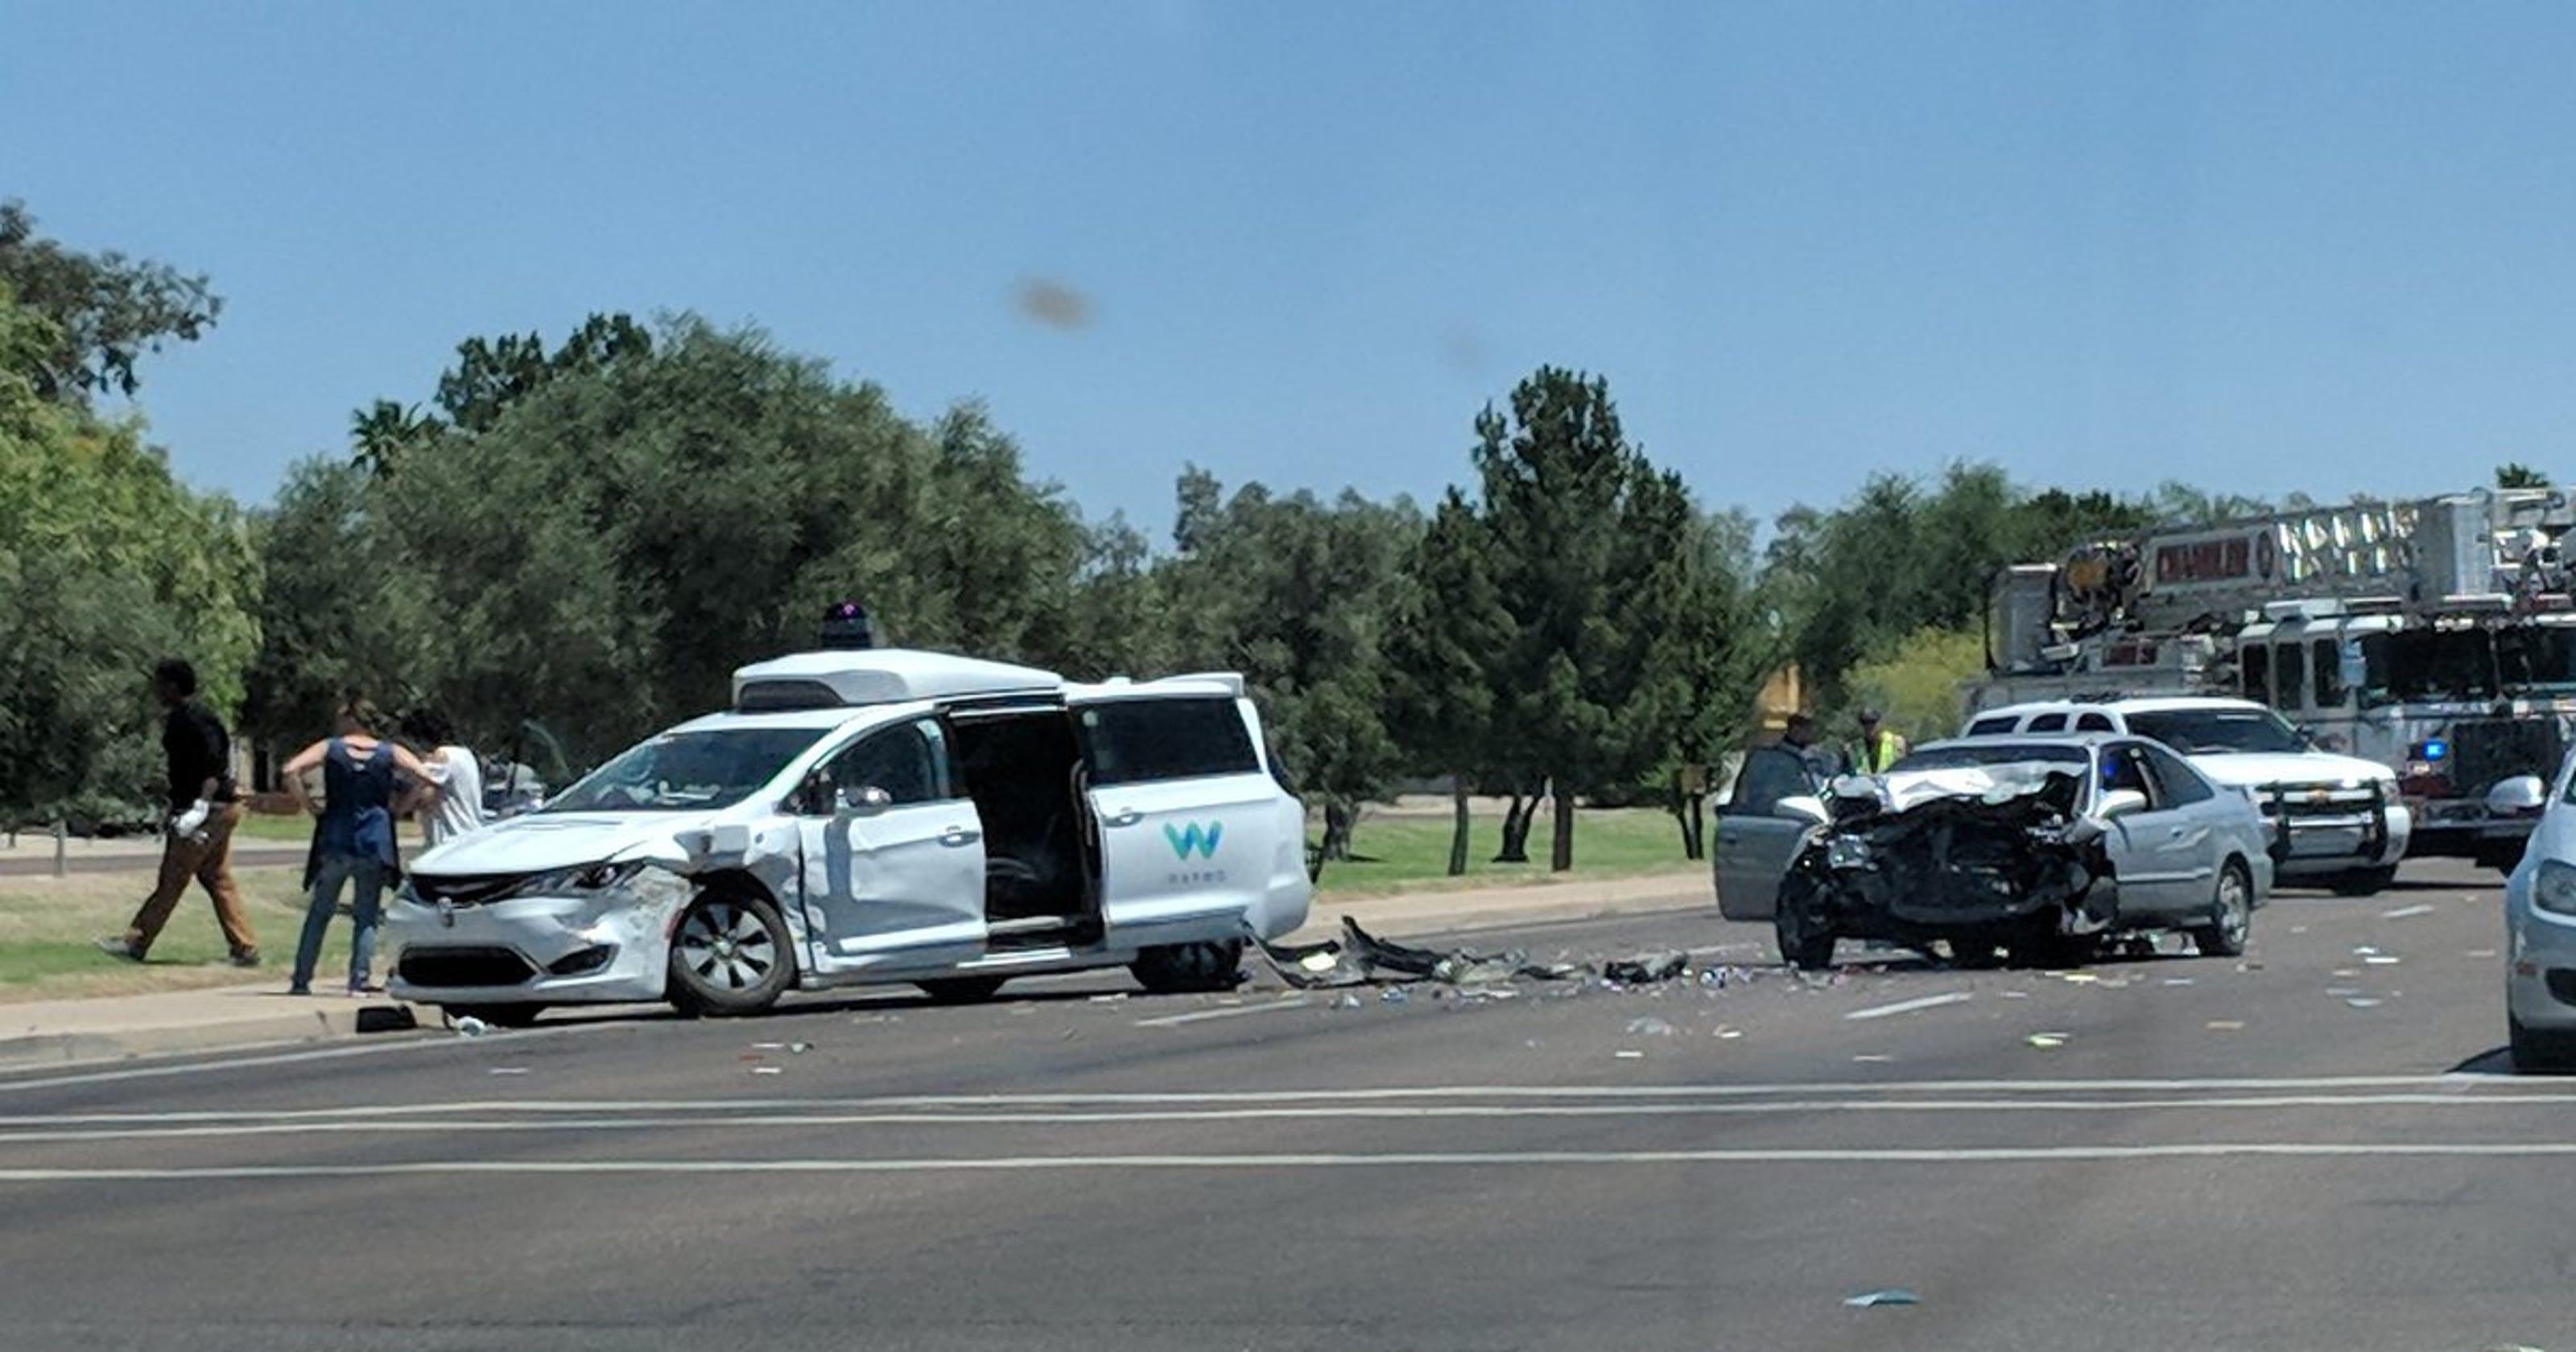 Video shows Google self-driving van being hit by car in Arizona